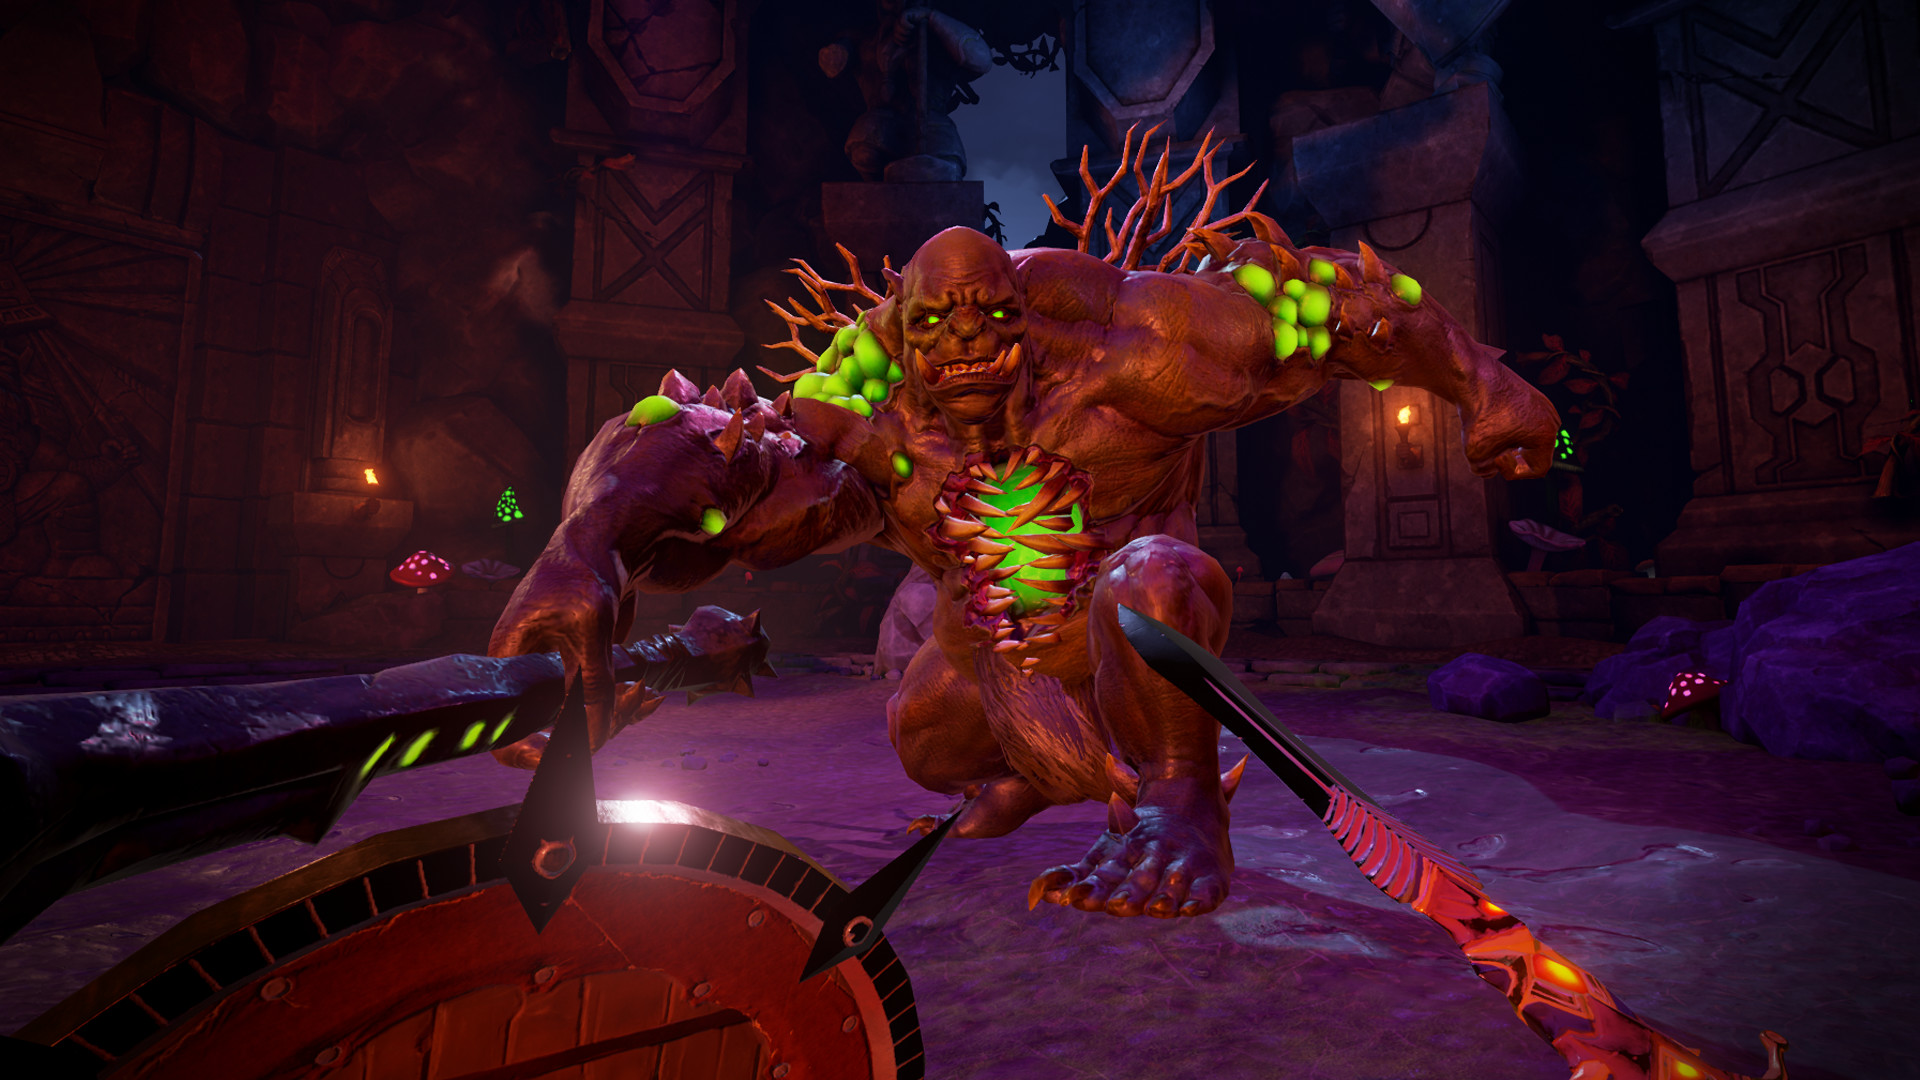 Karnage-Chronicles-Oculus-Rift-HTC-Vive-SteamVR